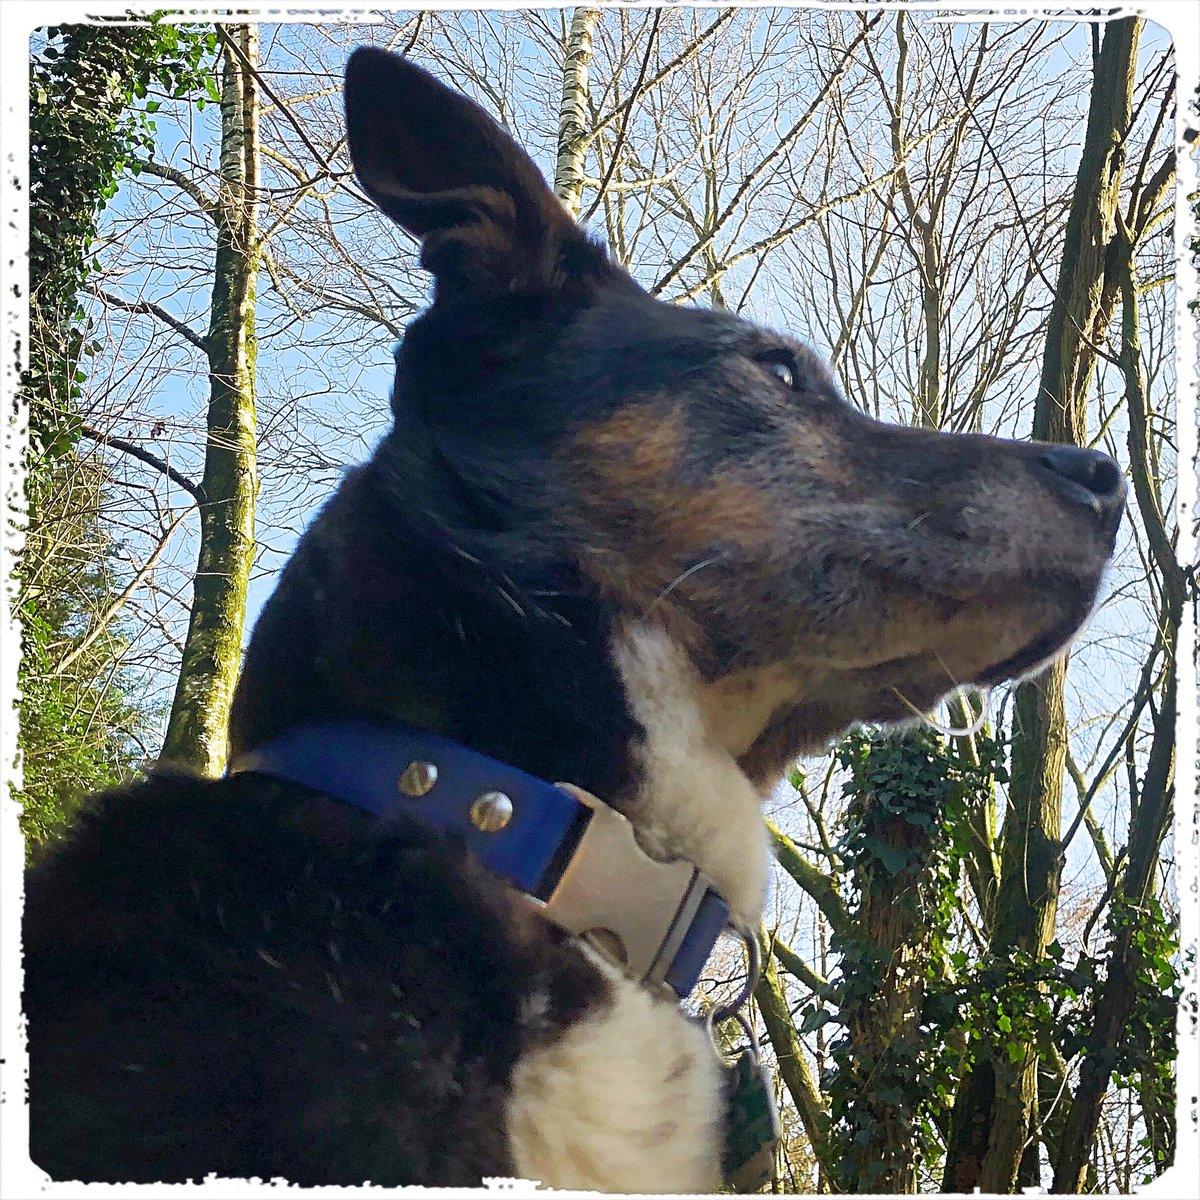 It's Malou on #happyfriday  .  #doglover #ilovemydog #instadog  #meinhund #dogs_of_world #dogsearth #puppies #hund #hundeliebe #hundeschule #dog #dogislove #trustrespectlove #hundeland #hundeblog #lieblingshund #fellnase  #besterhund #dogsneeddogs #doggy #dogs #besterhundpic.twitter.com/GE0AfSW94E